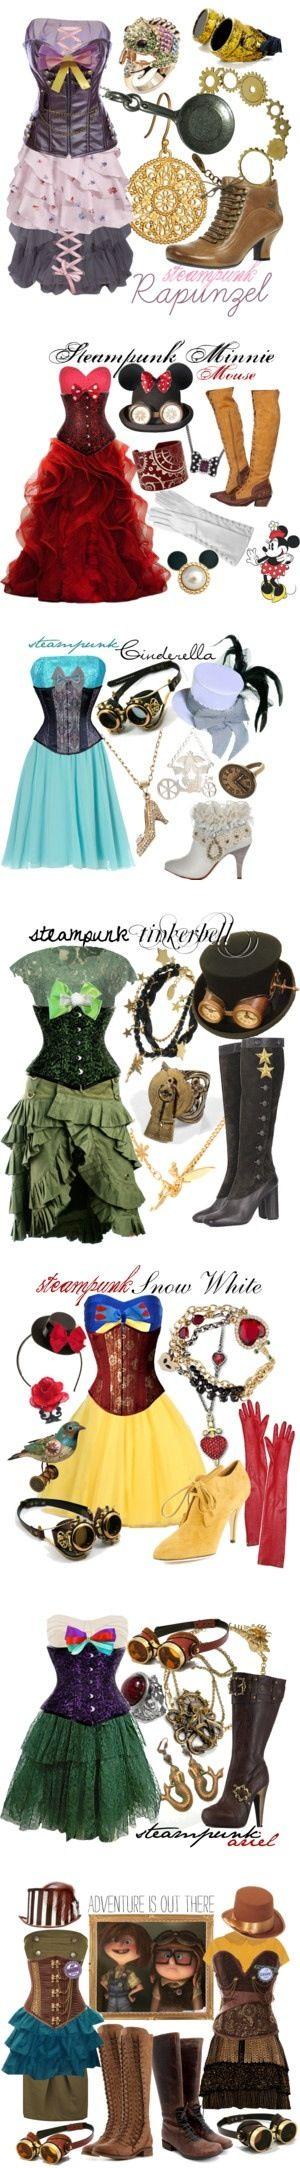 Fashion/Disney Steampunk style Inspiration <3 Someday Imma make Leigh and Myself steampunk disney princess costumes :p